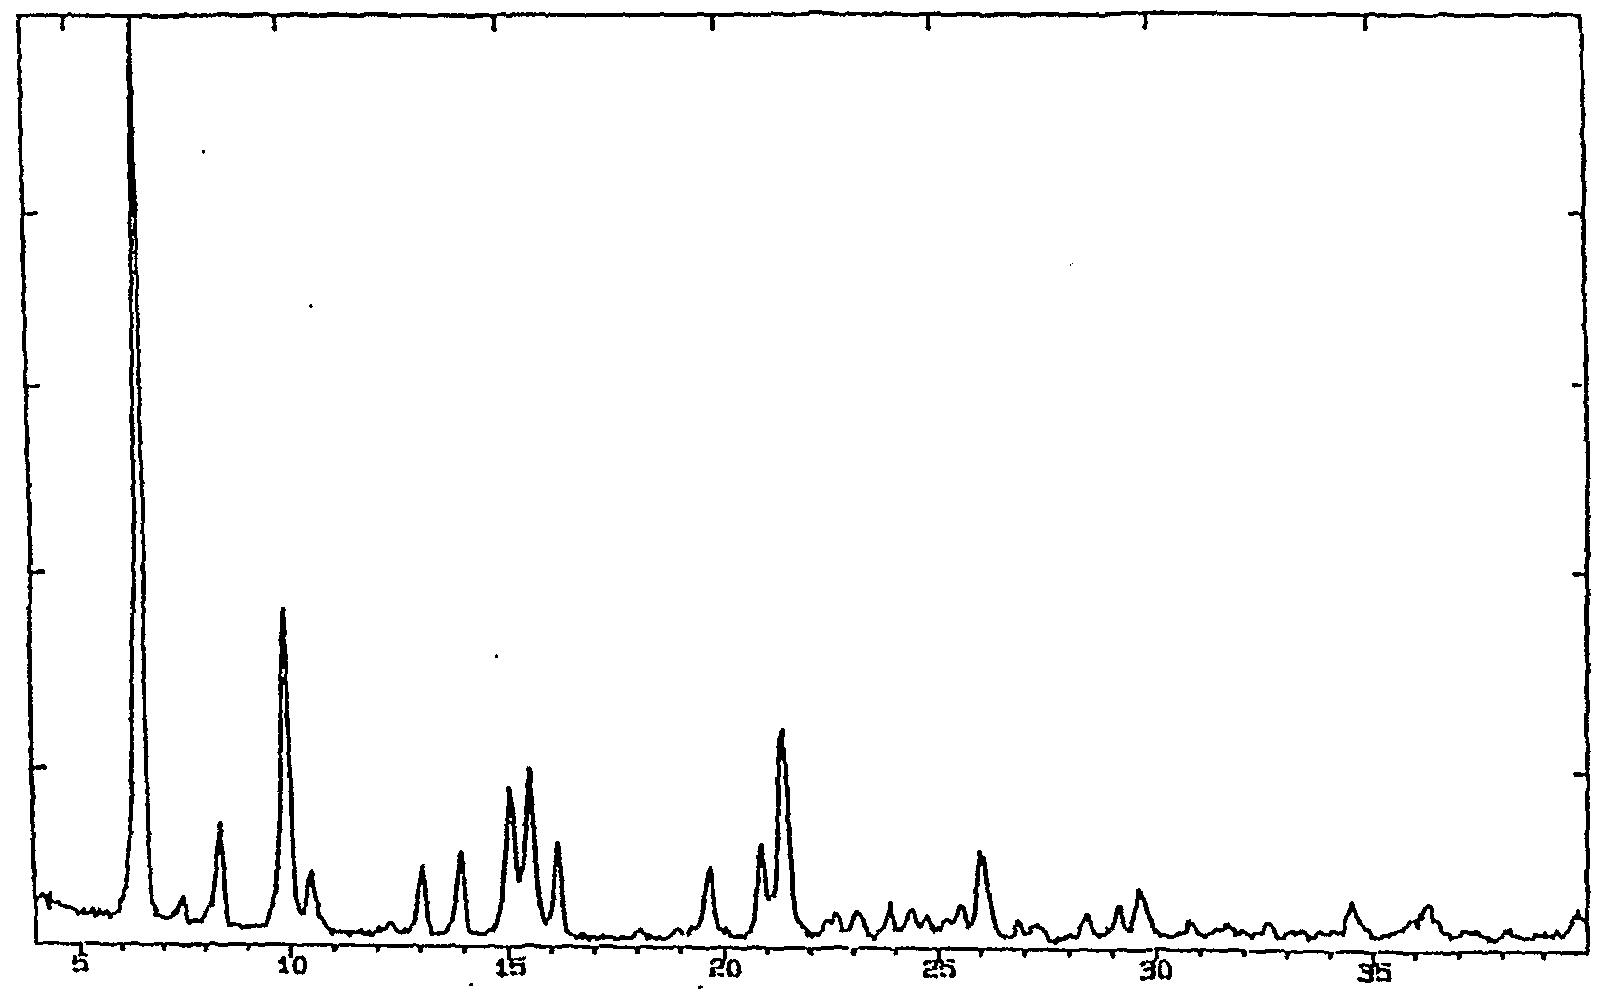 The 1  2-dichloroethane  1,2 Dichloroethane Nmr